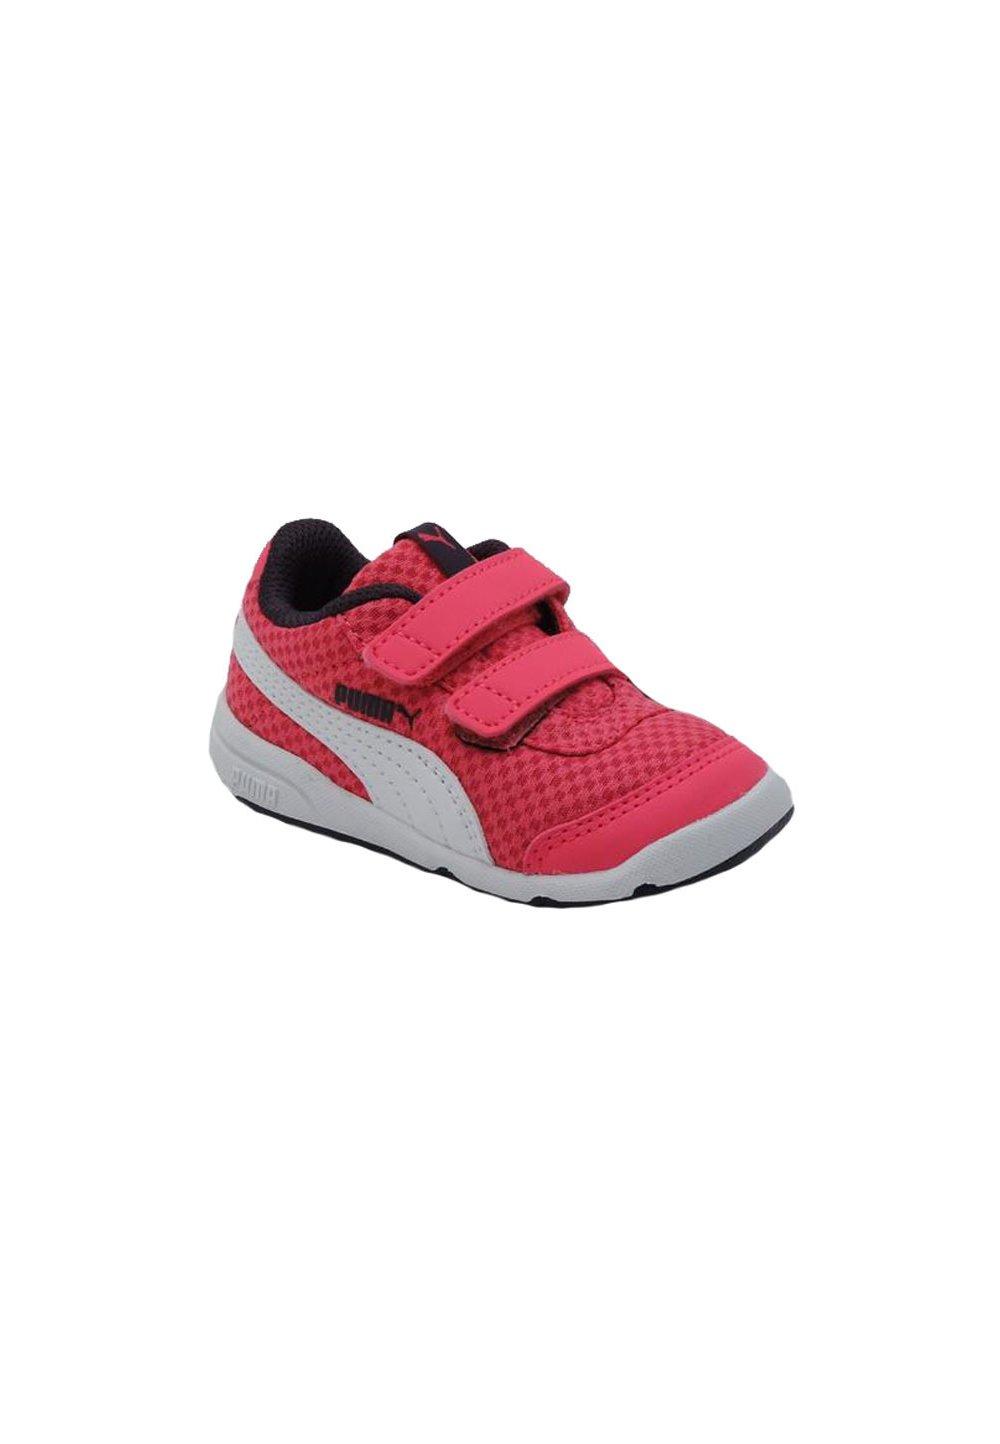 Pantofi sport, Puma, roz imagine